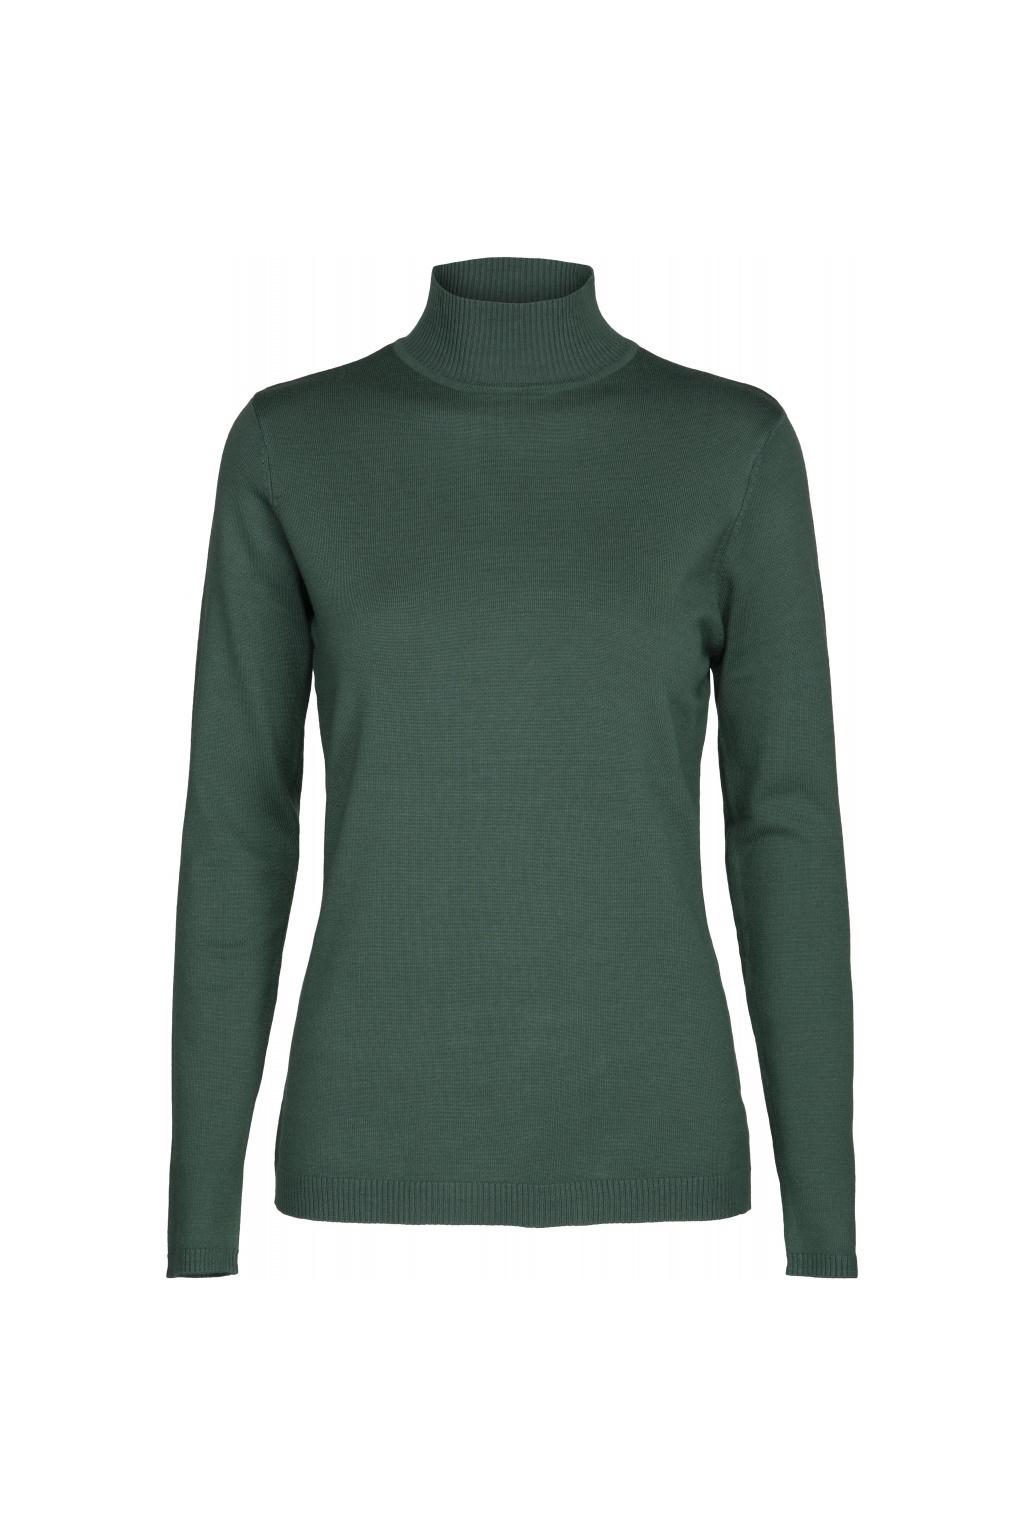 Lana Roll Neck Knit - Hunter Green Melange-1